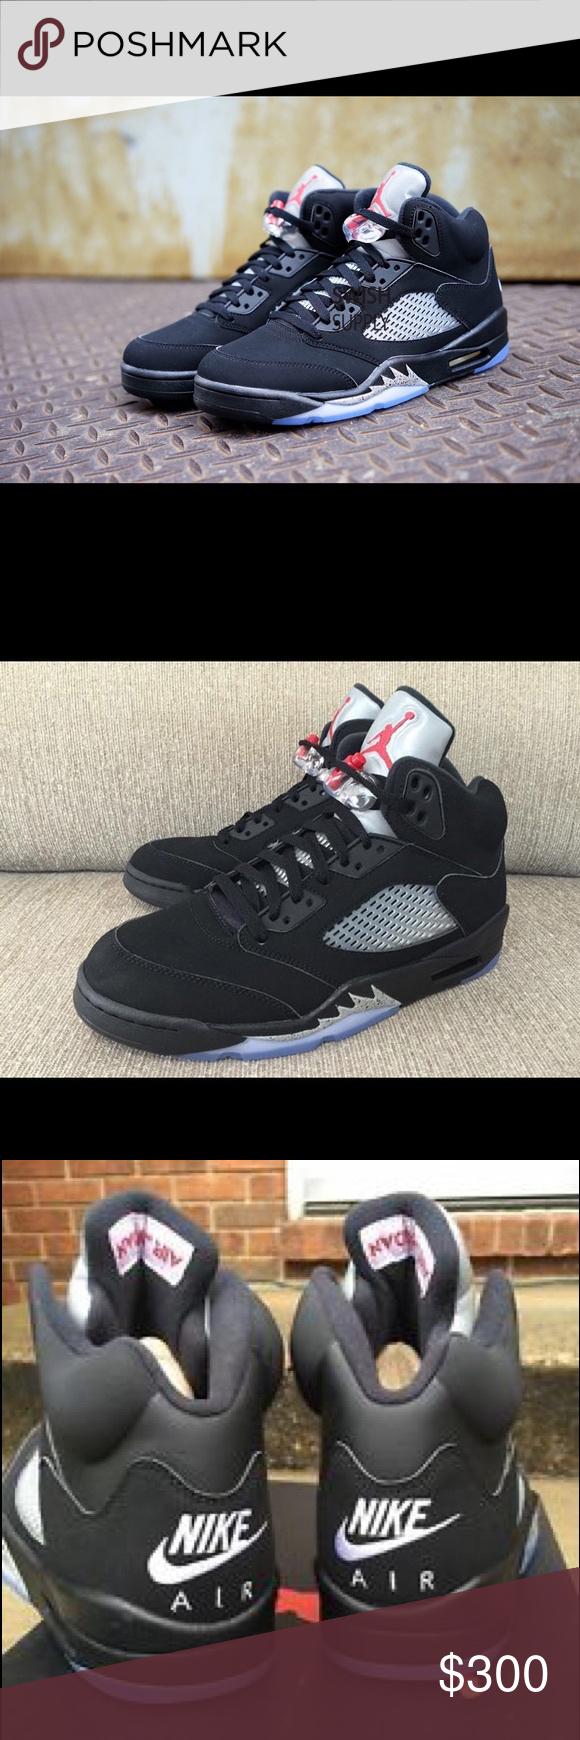 mens jordan shoes size 10 brand new 808568